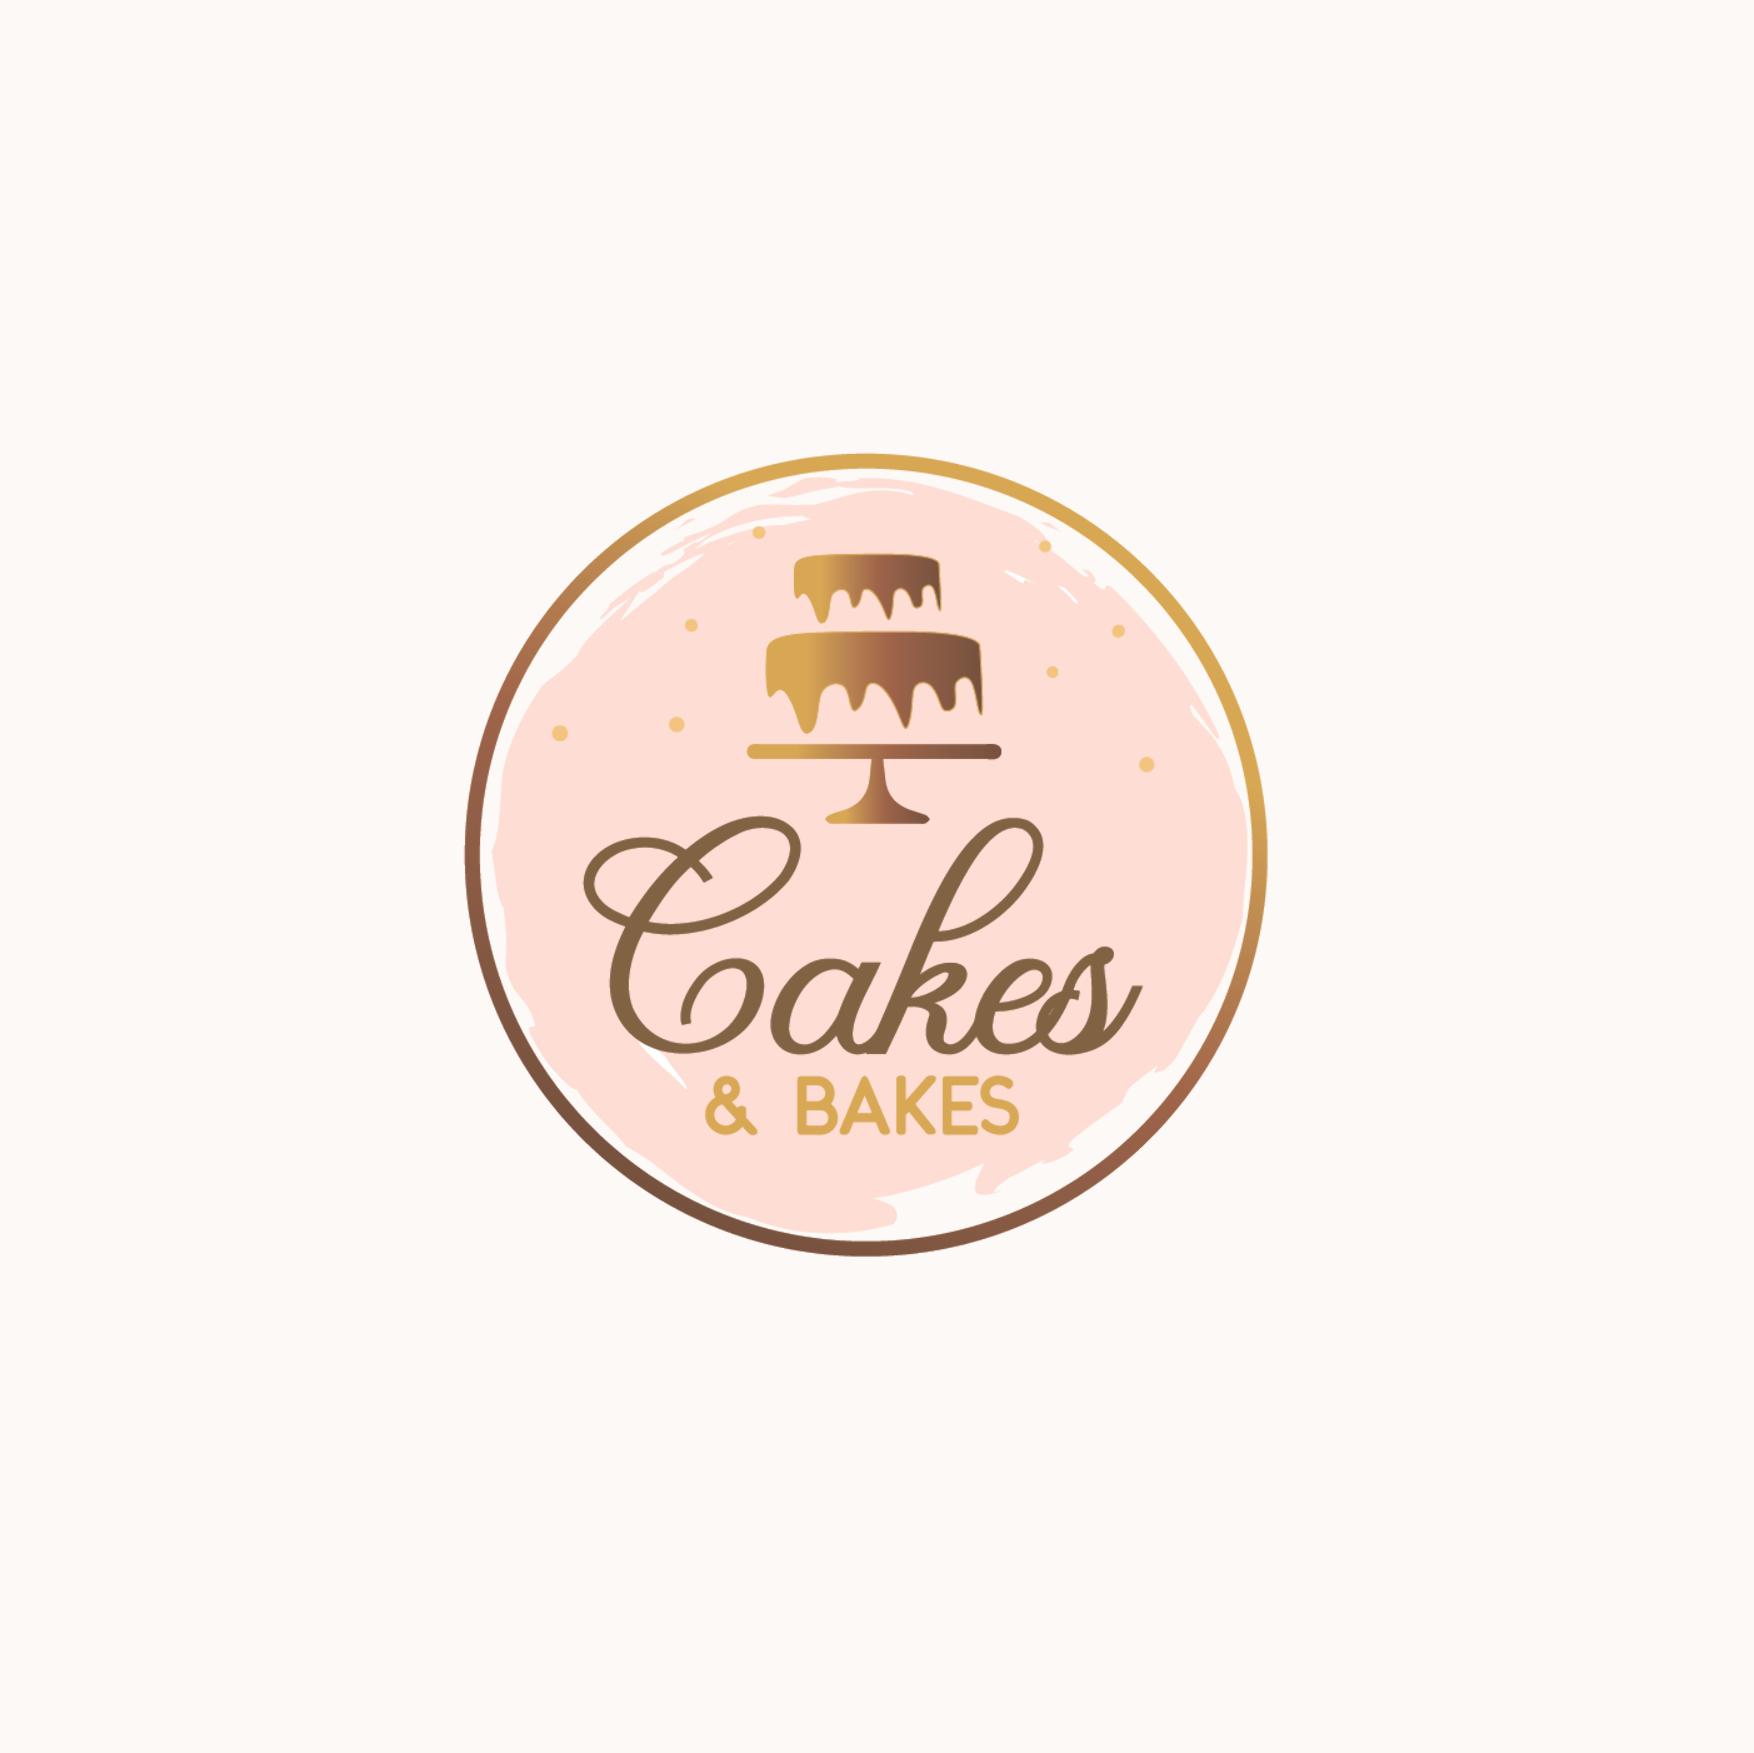 Cakes & Bakes Logo Design for sale. visit Baking blog